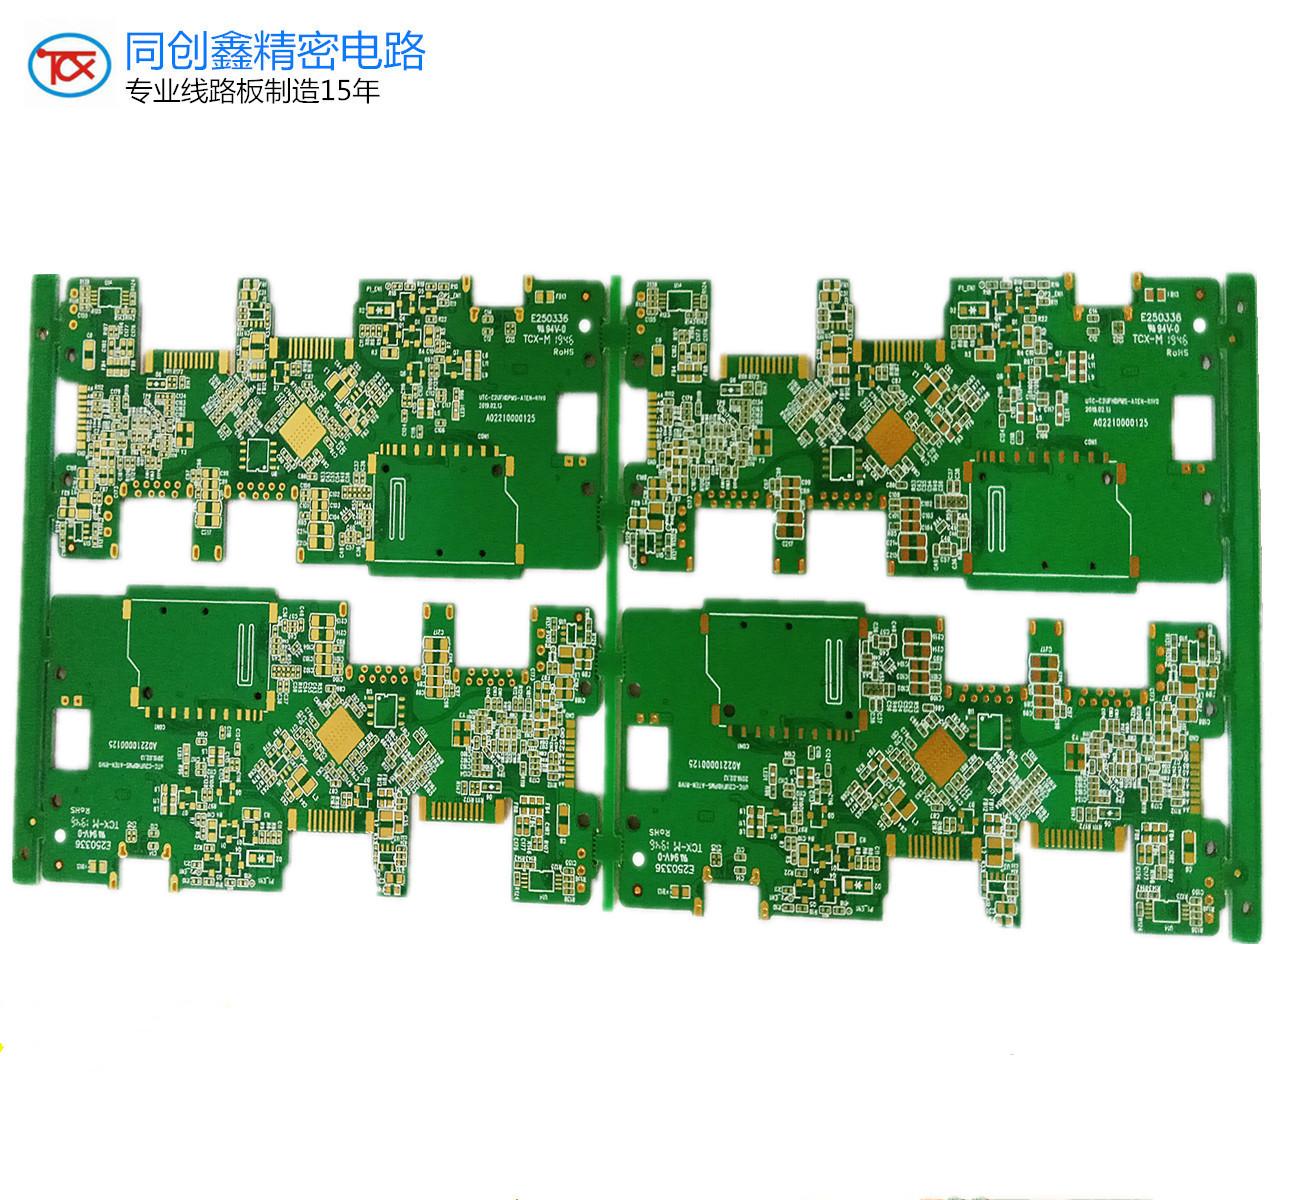 PCB多层电路板,深圳市线路板生产厂